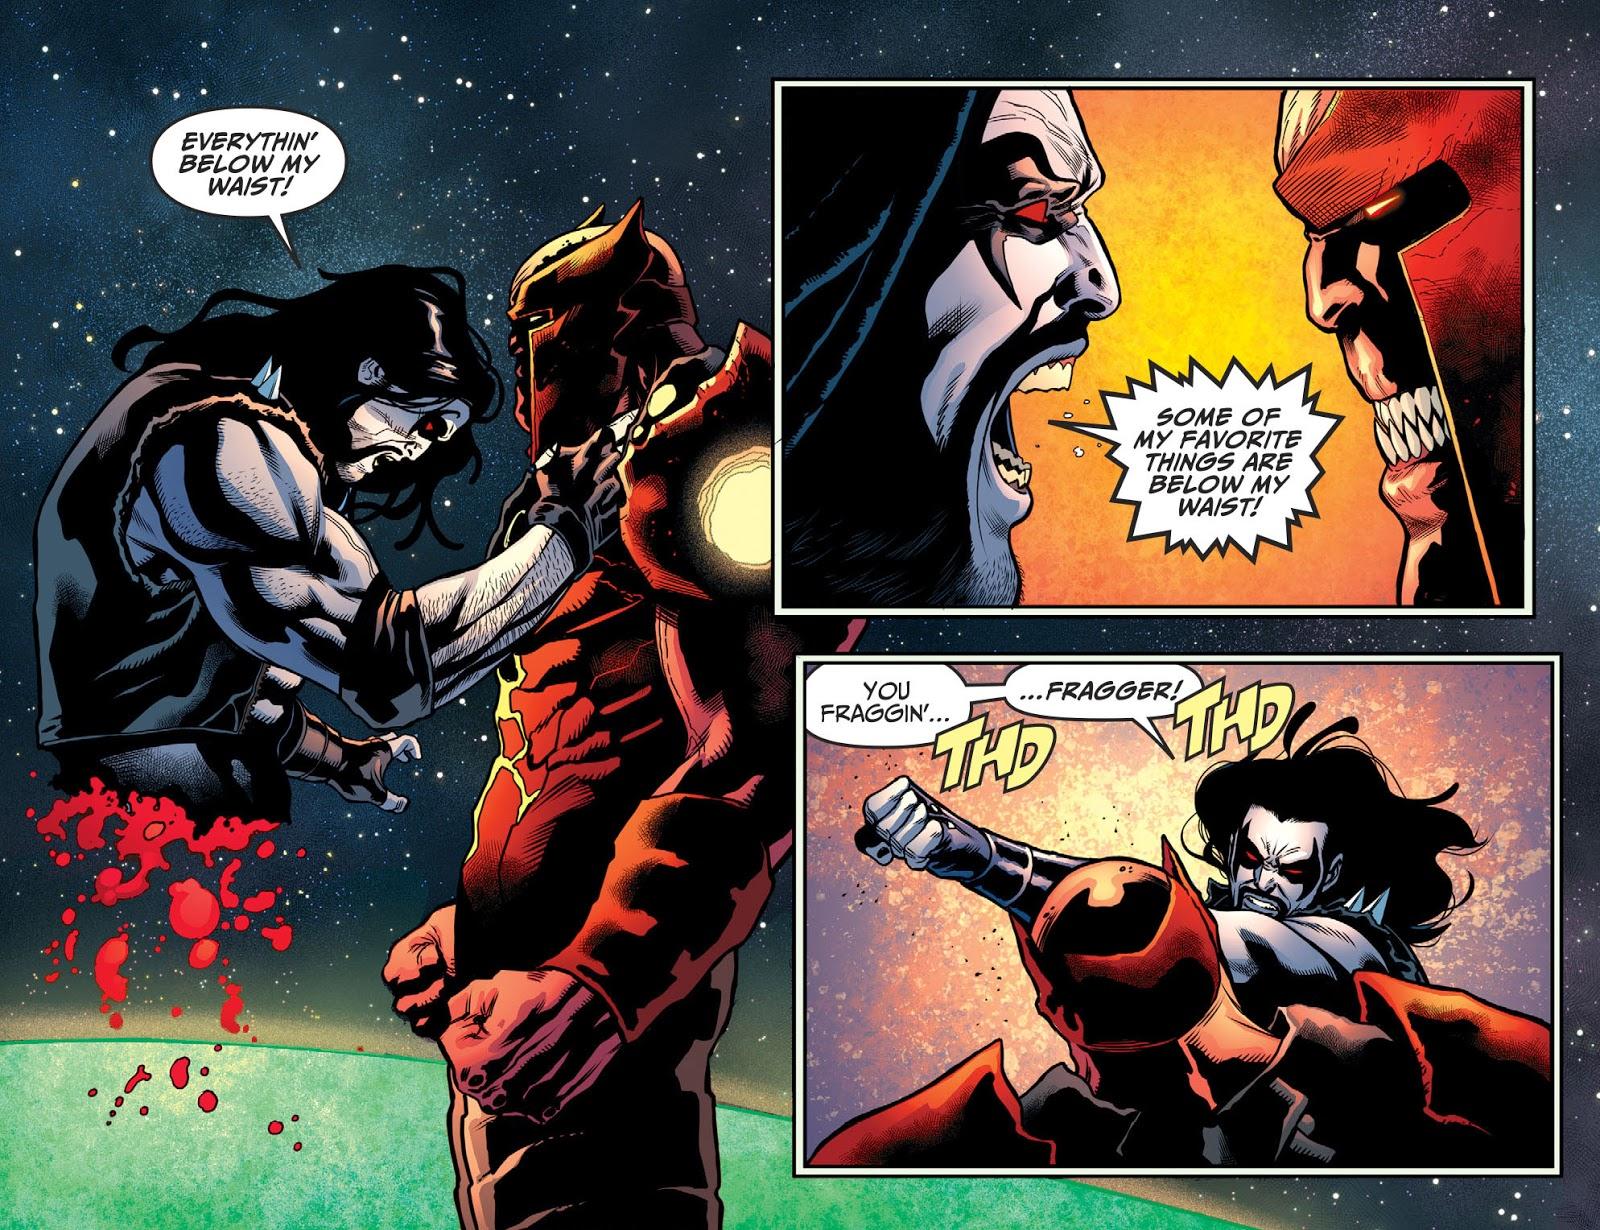 Atrocitus Cuts Lobo In Half (Injustice II)